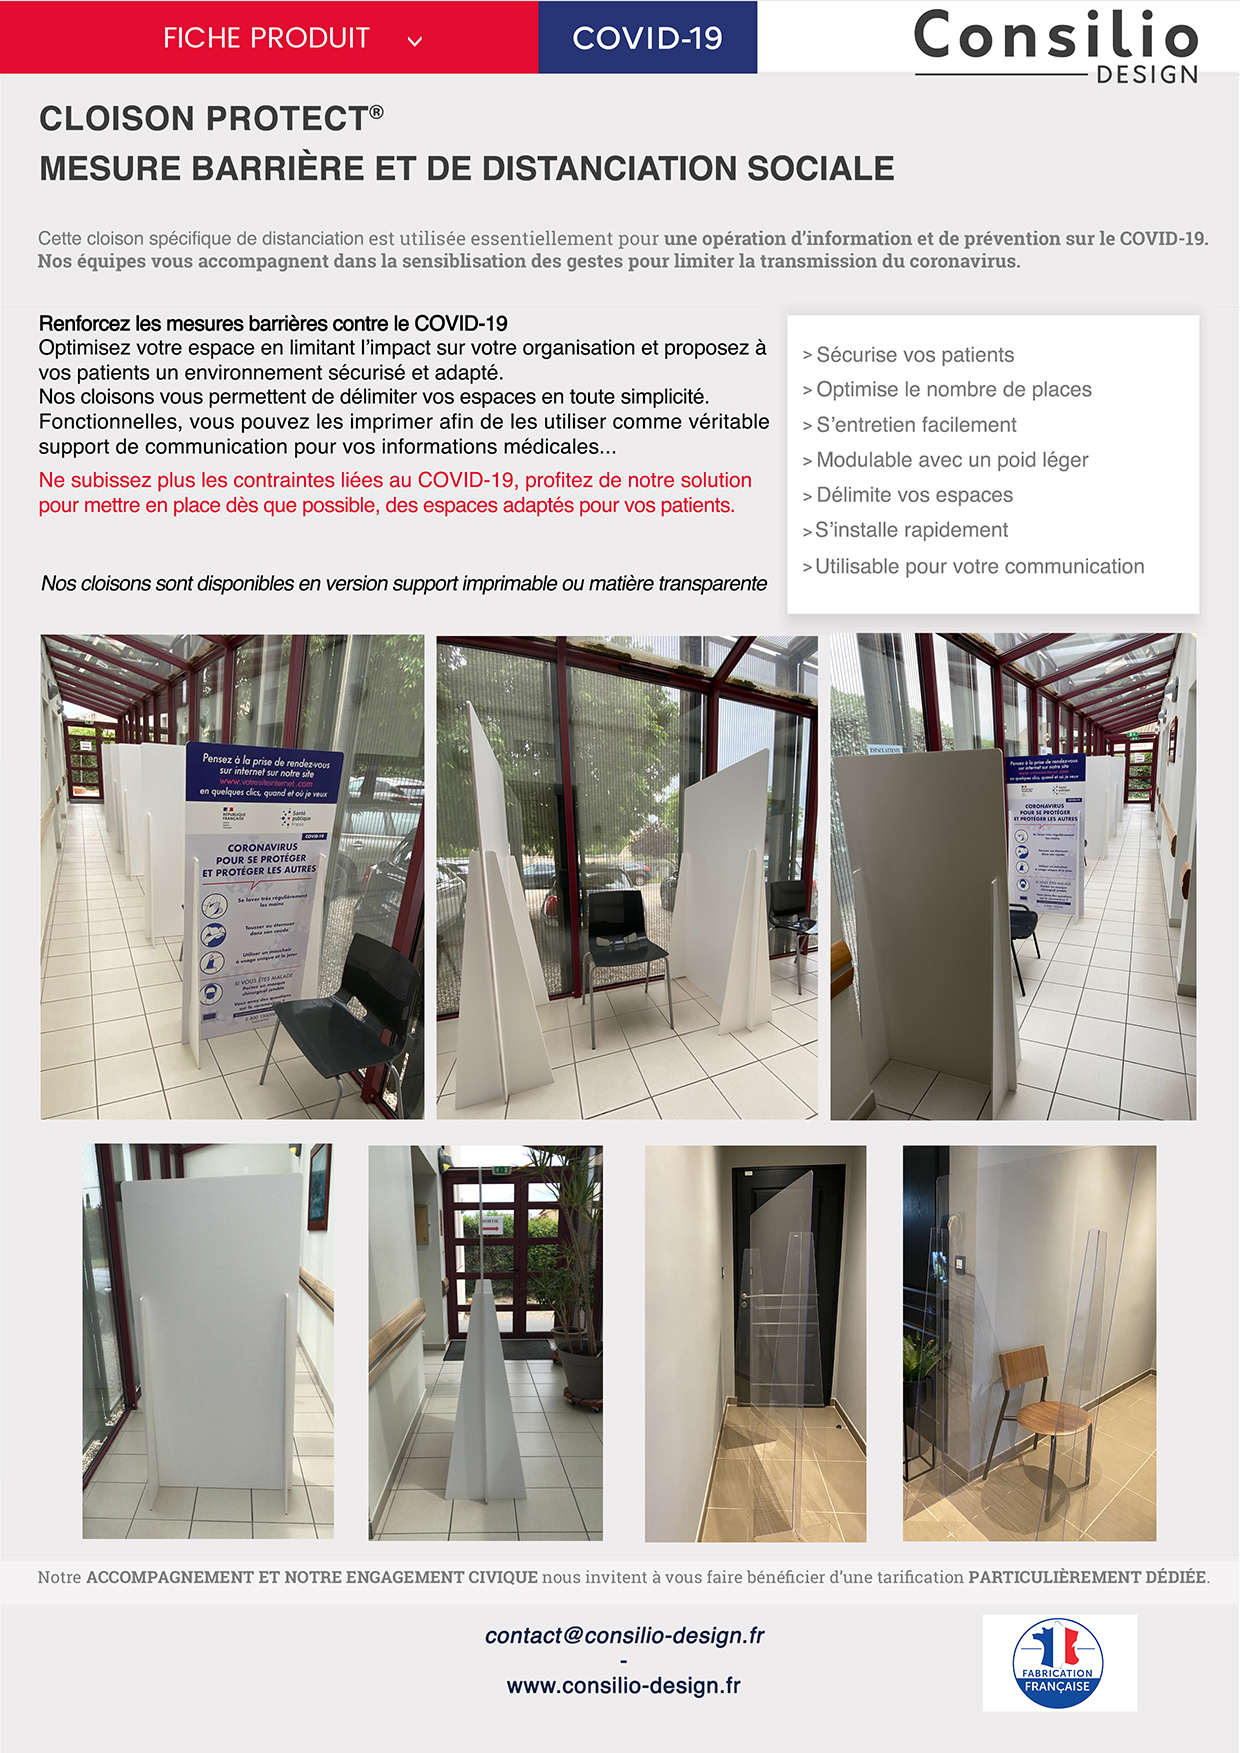 Consilio_Design_Cloison_Medical_Fiche_Produit_HD_COVID19